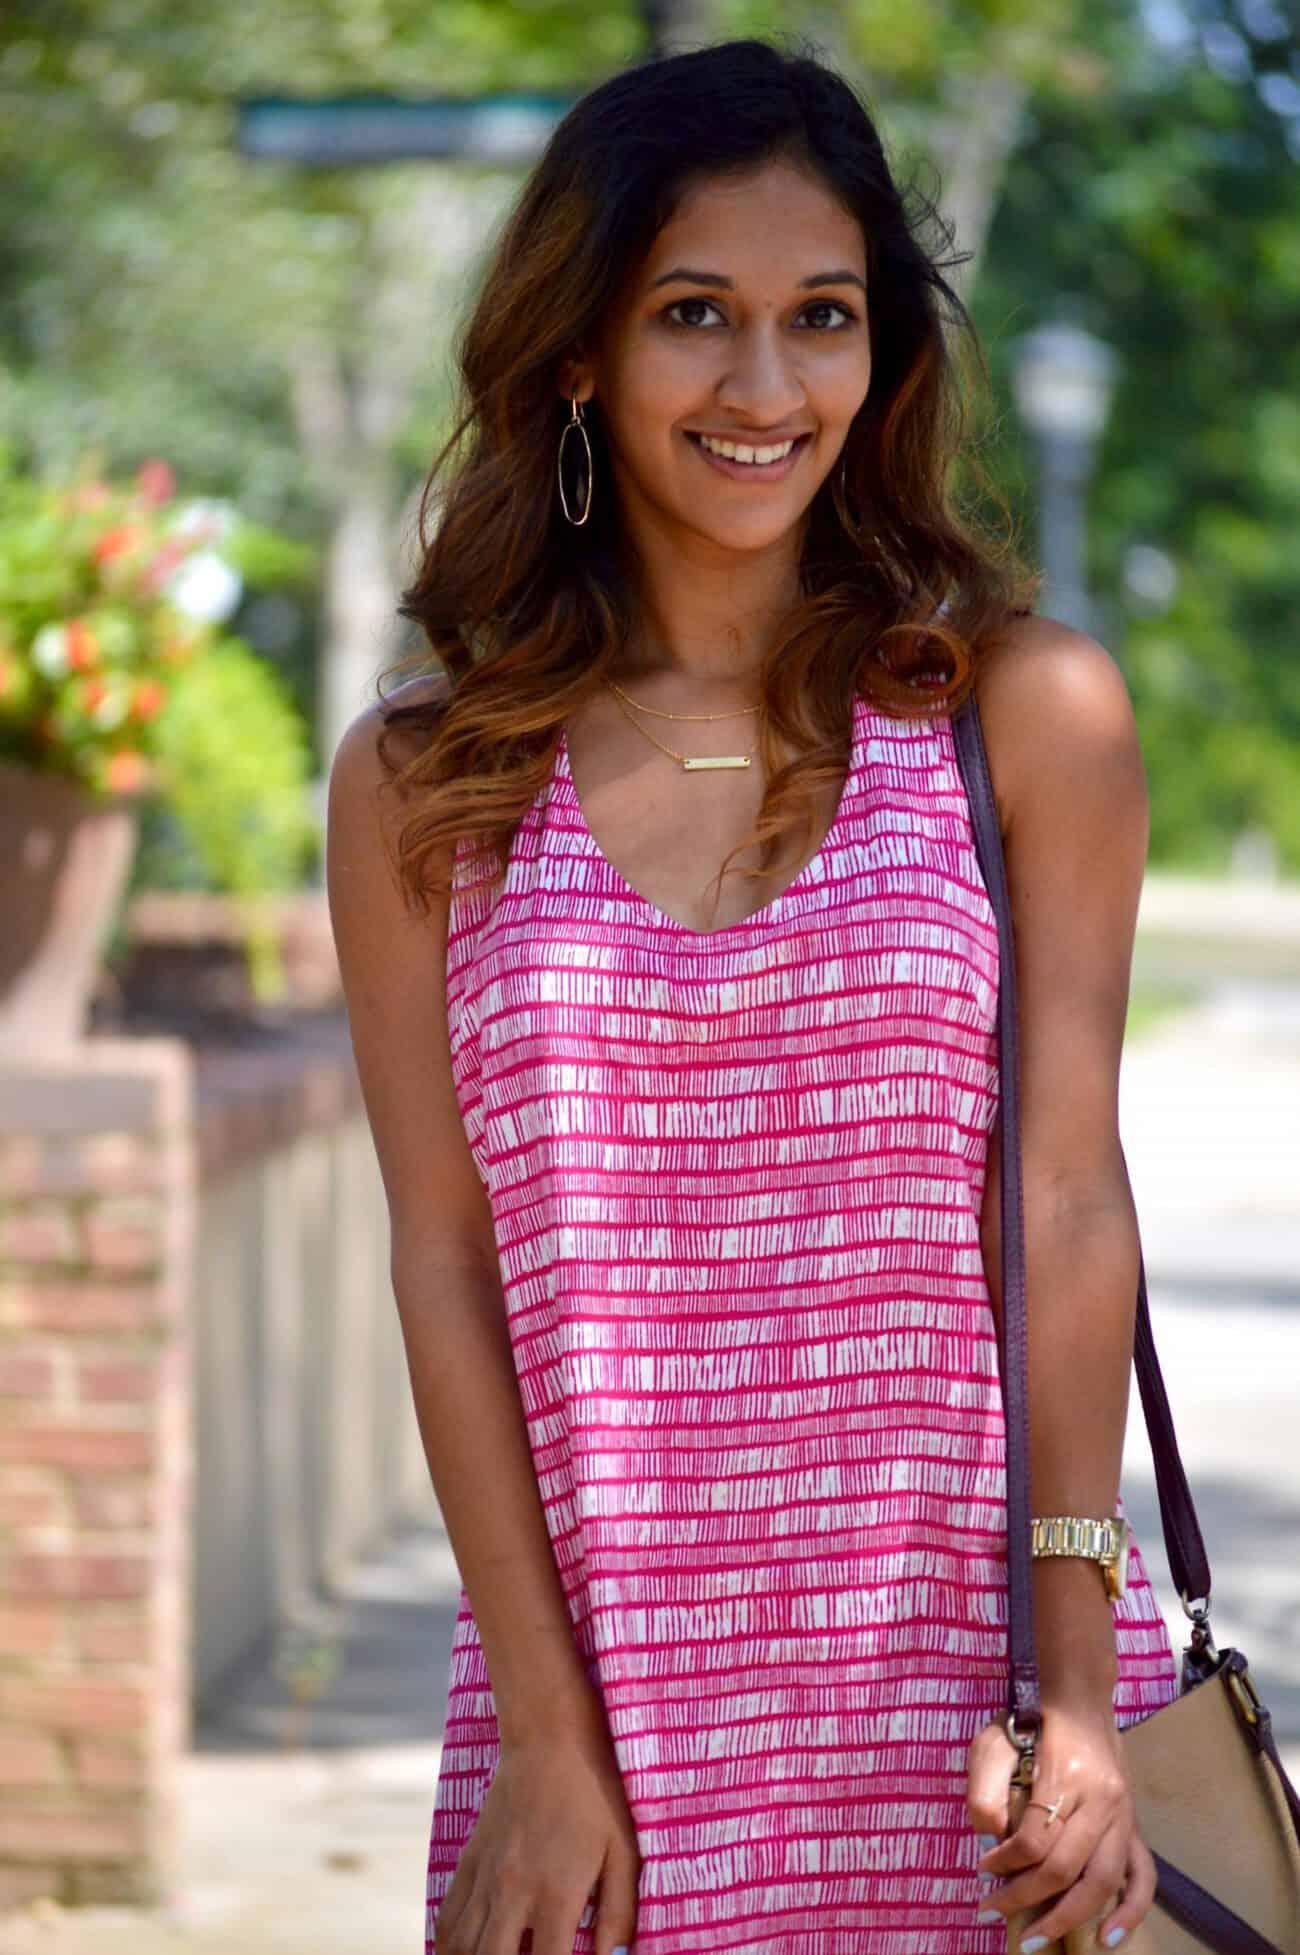 magenta print dress, pink